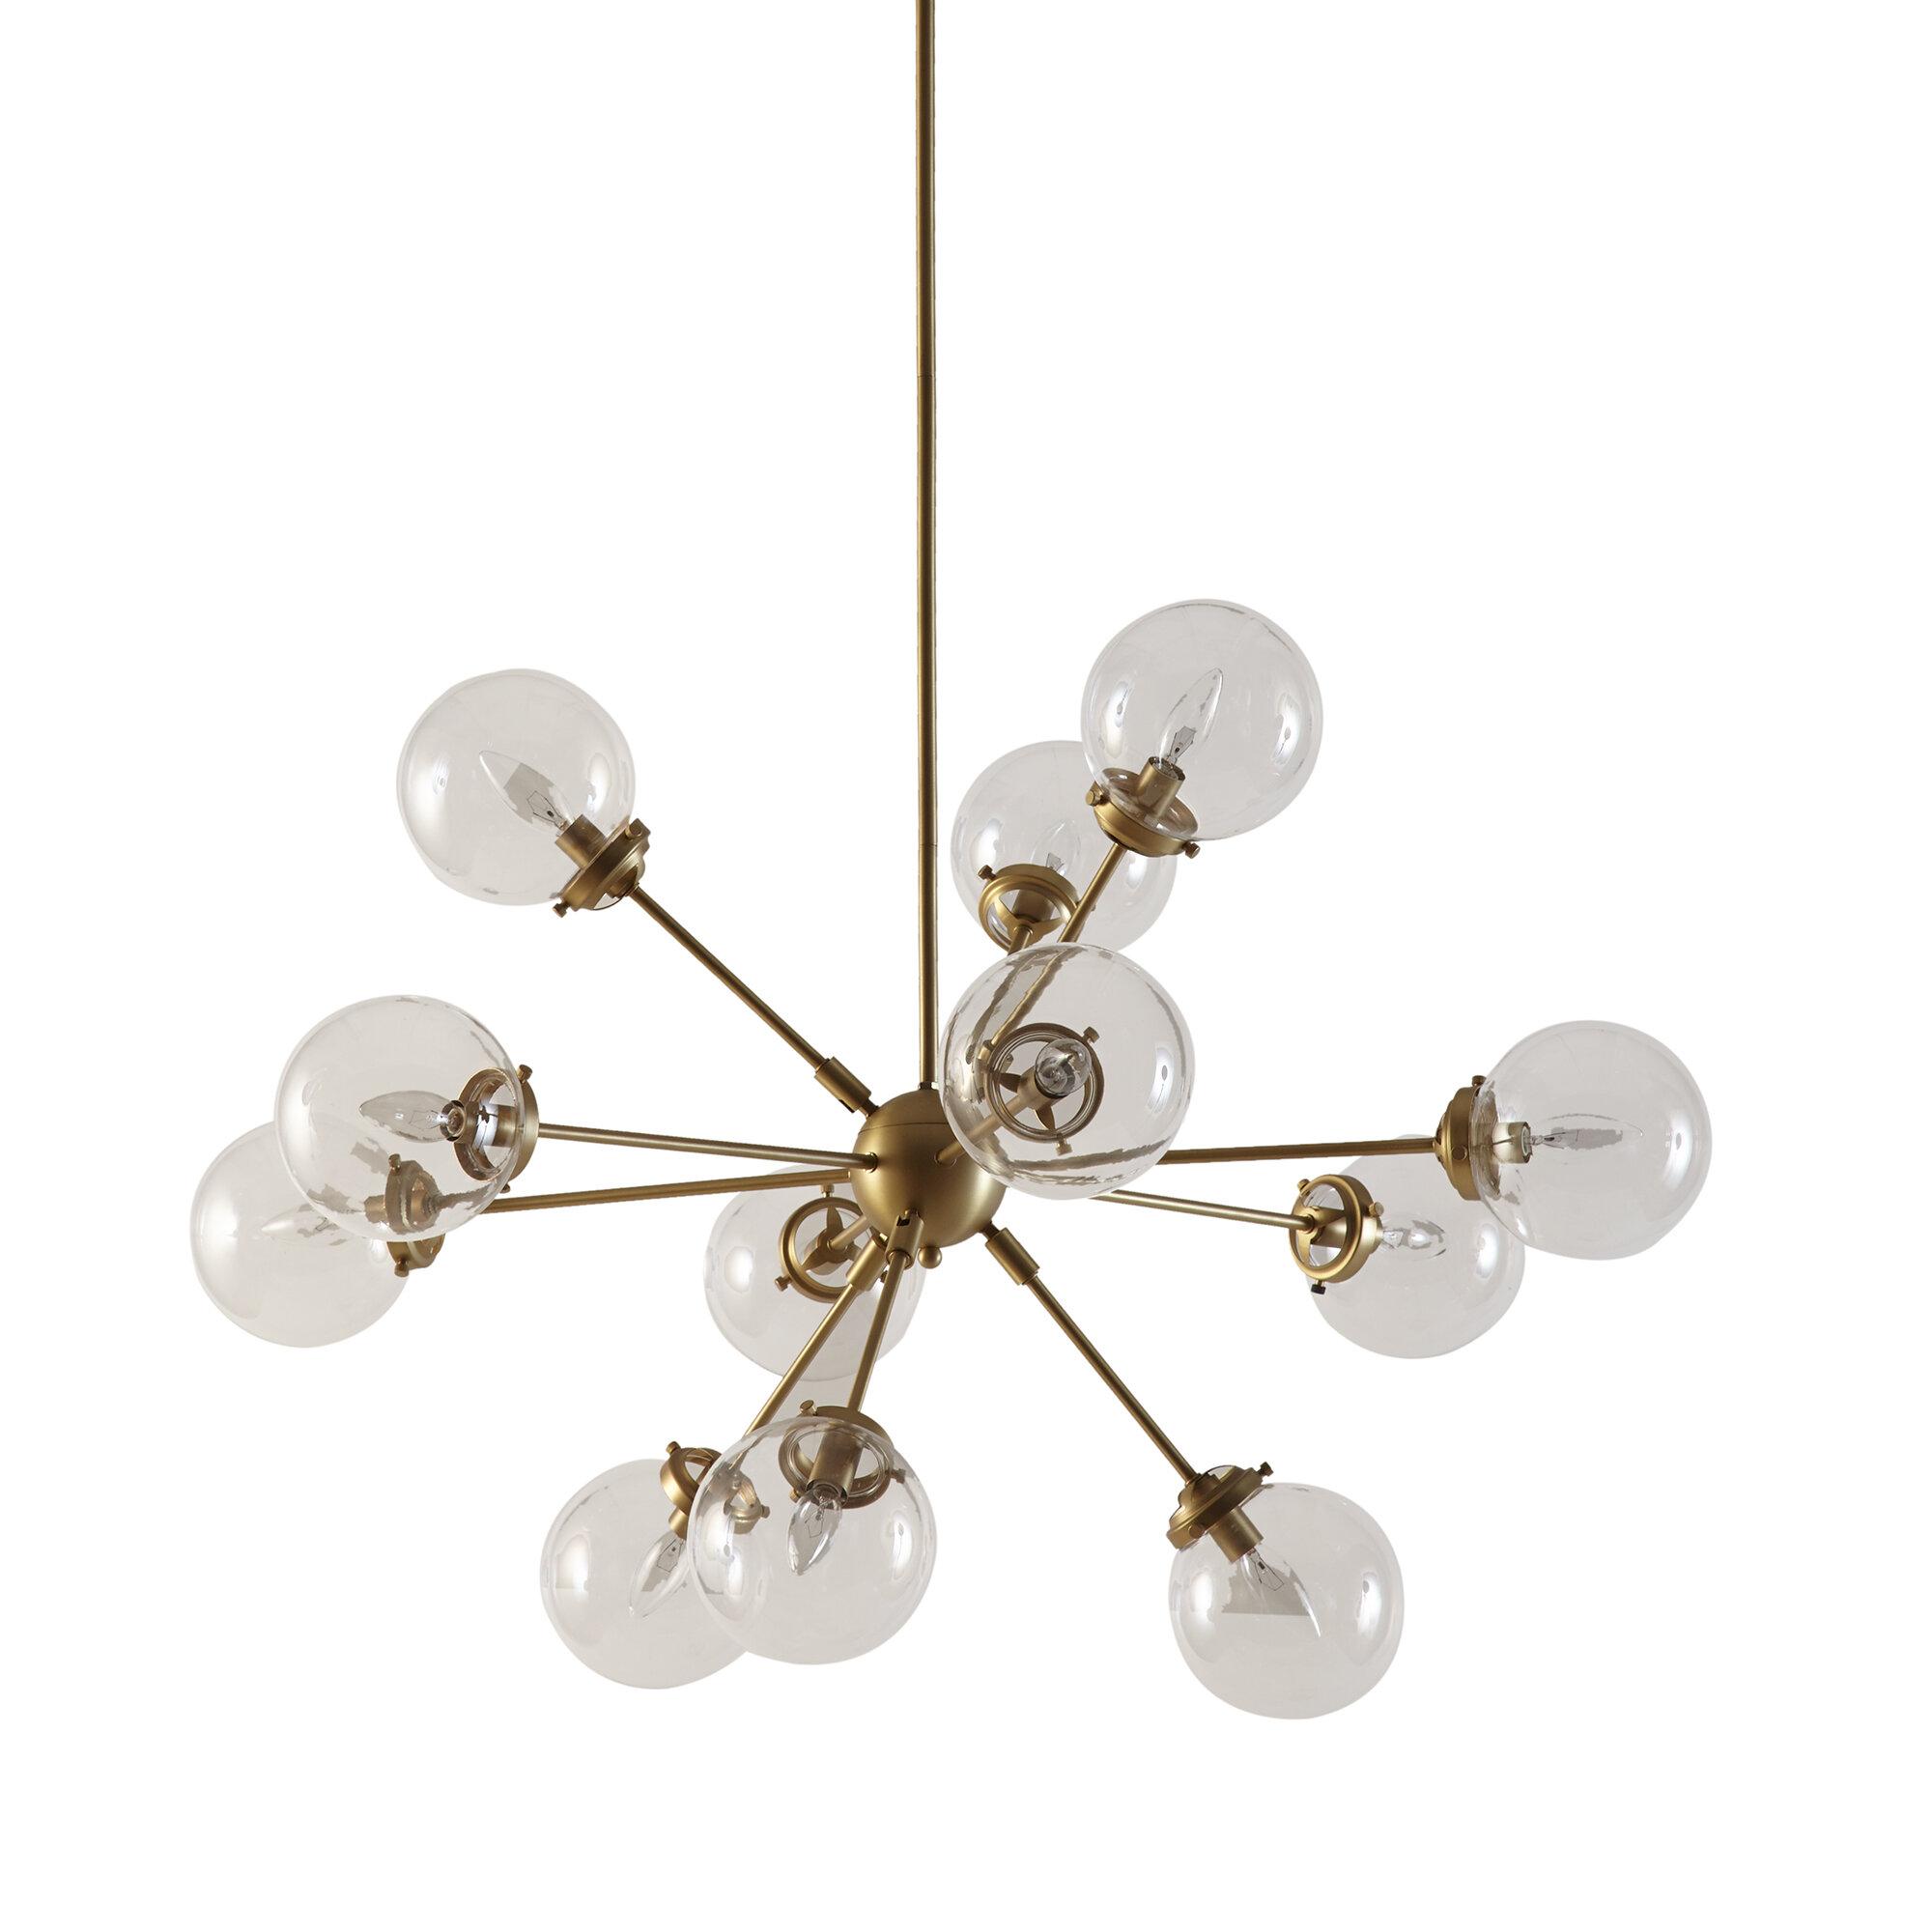 Asher 12 Light Sputnik Sphere Chandelier